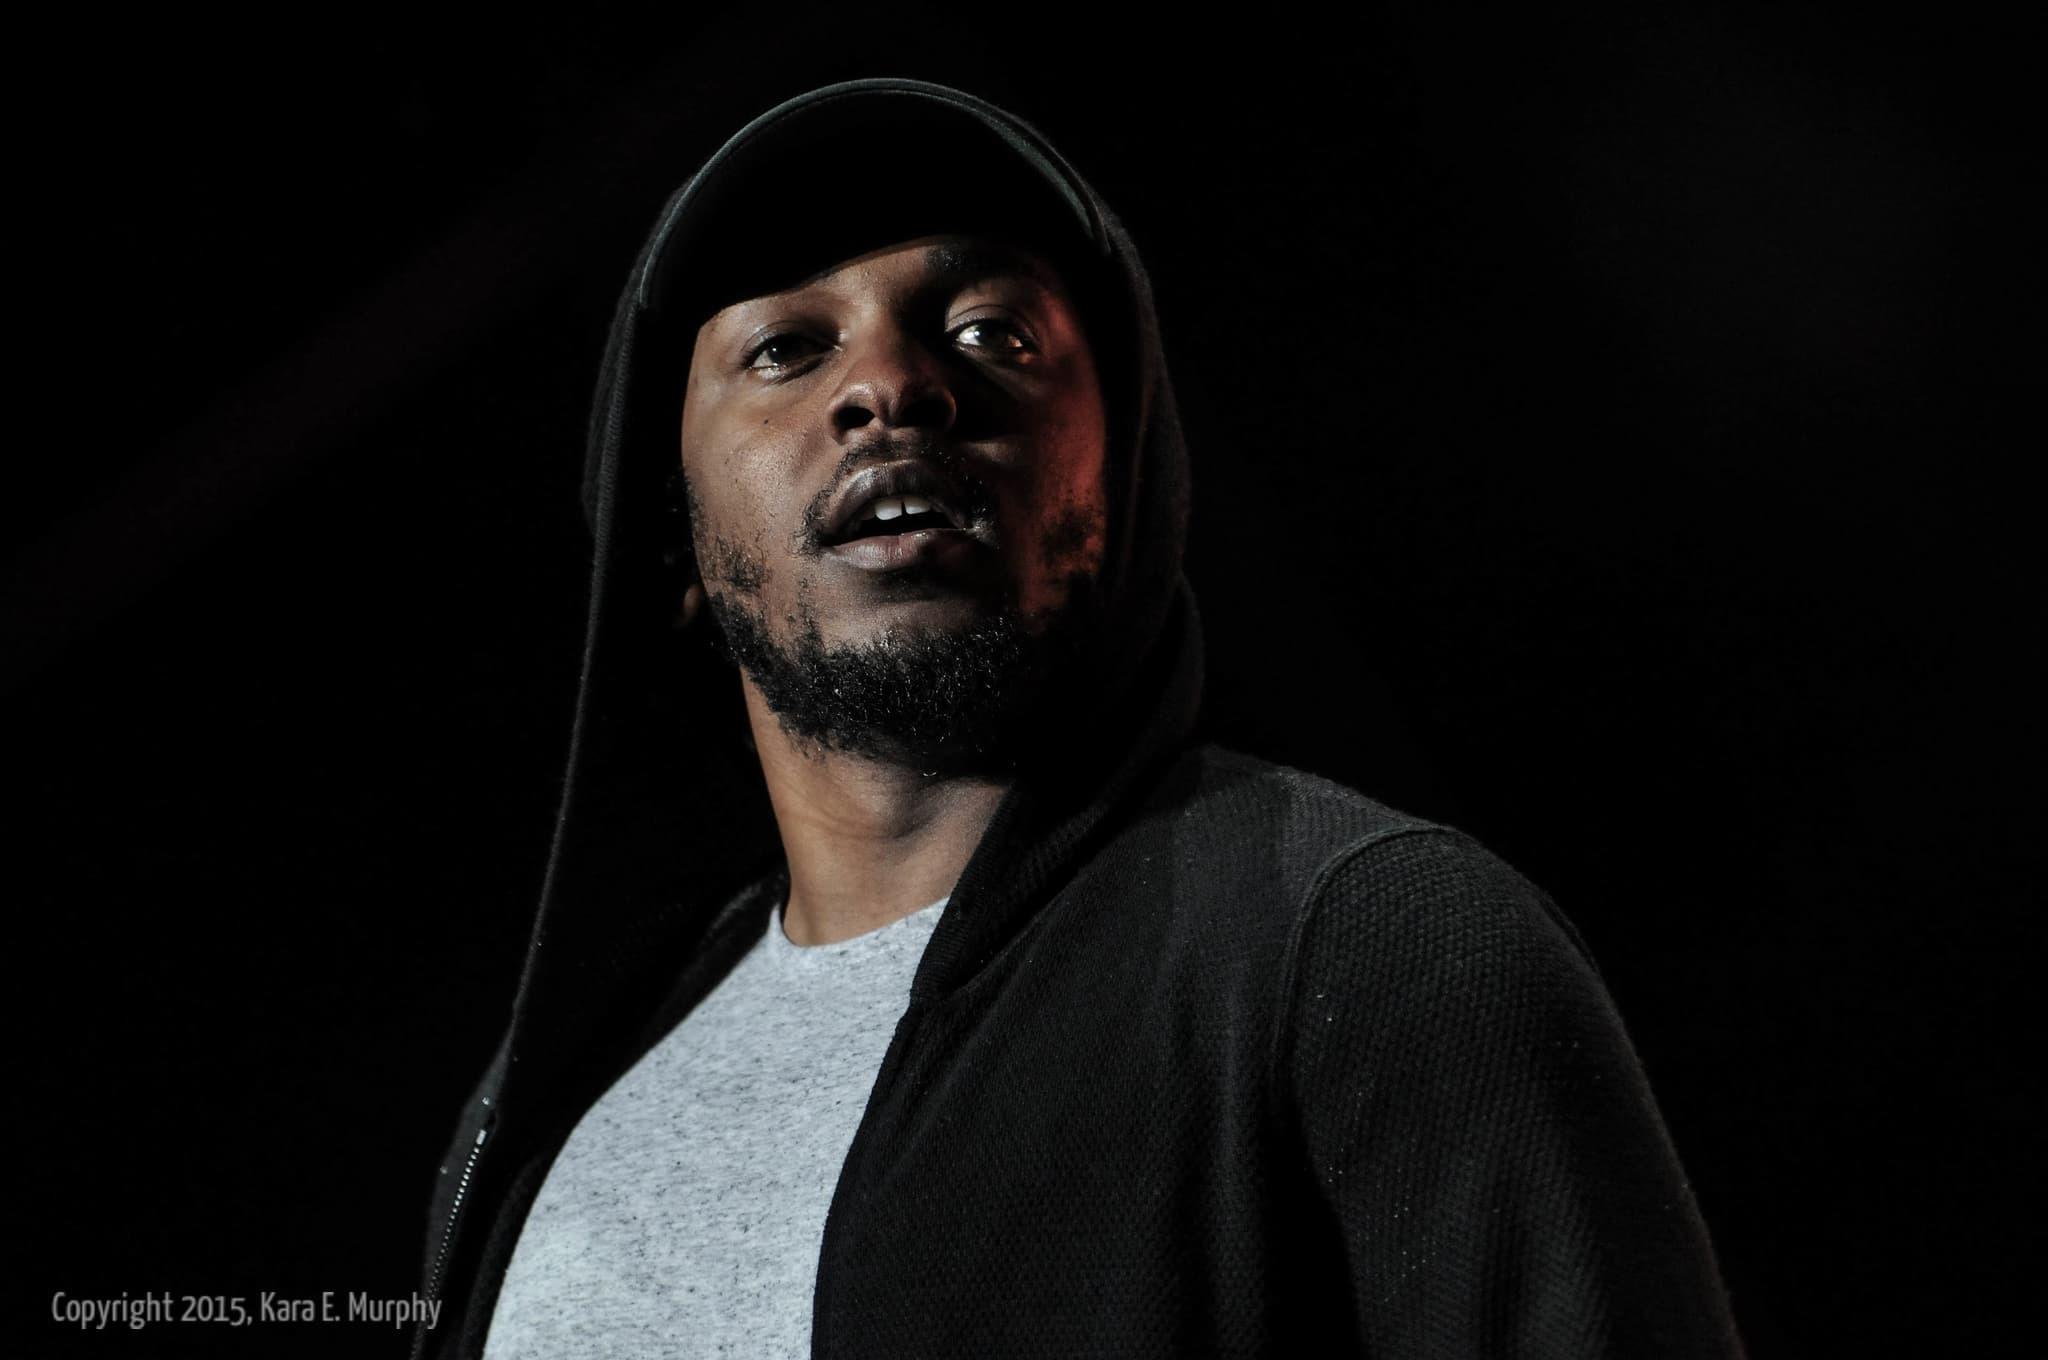 Kendrick Lamar Wallpapers HD